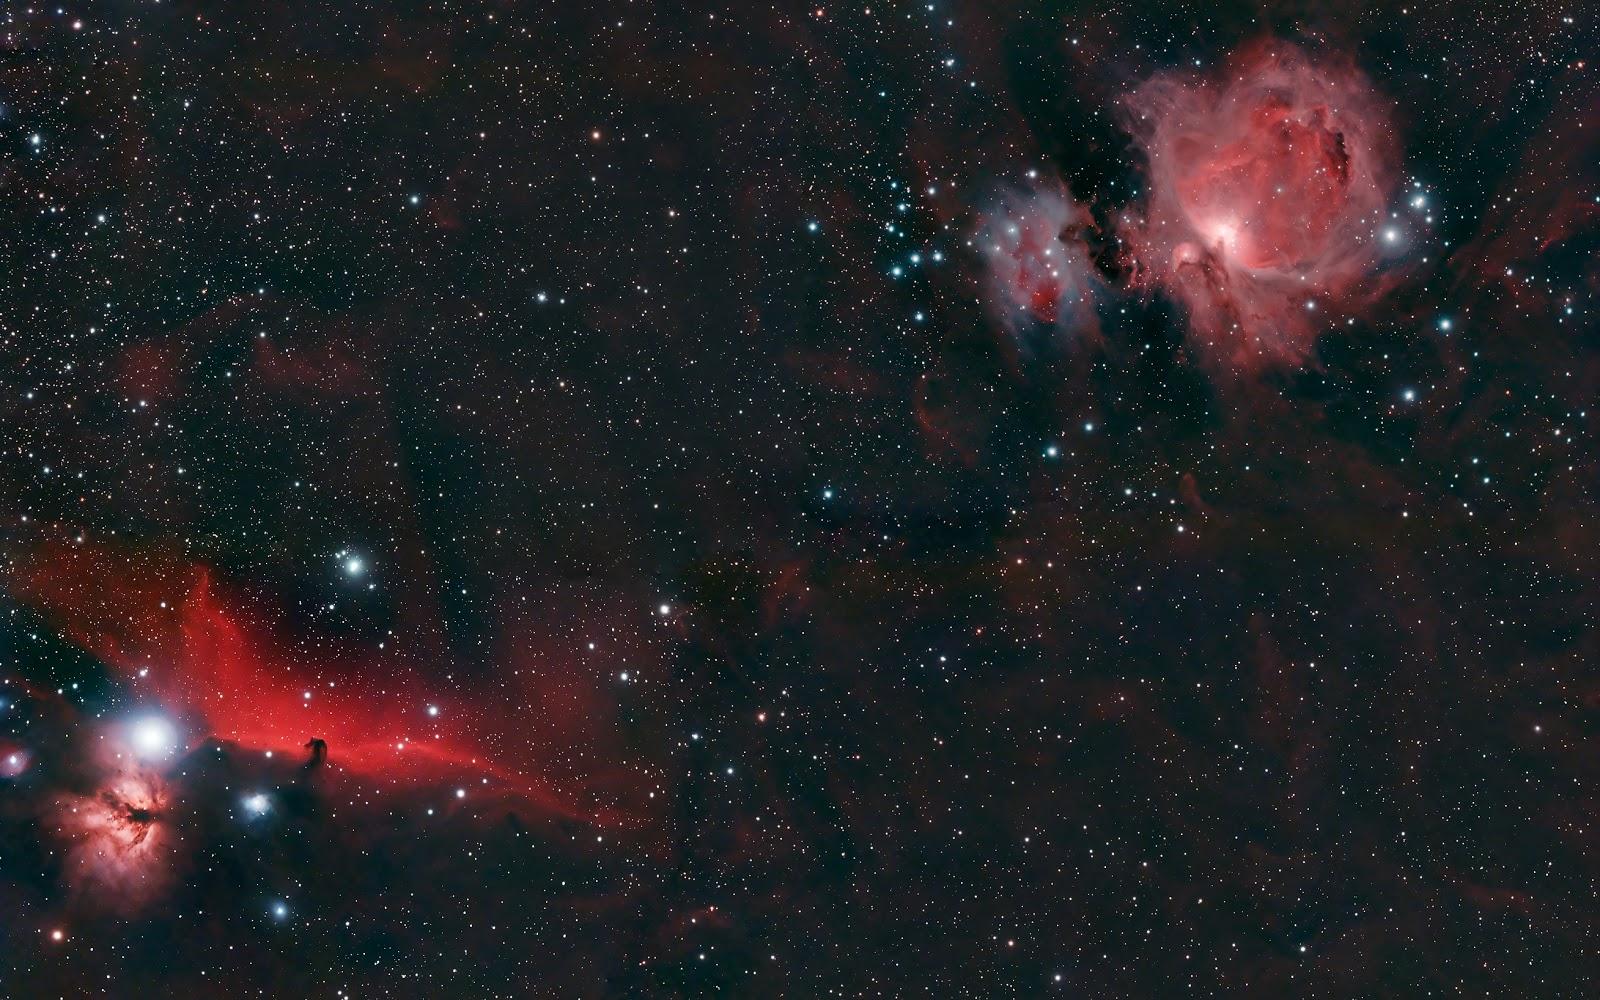 Most Inspiring   Wallpaper Horse Nebula - Horsehead-Nebula-Wallpaper-HD-15  2018_501382.jpg